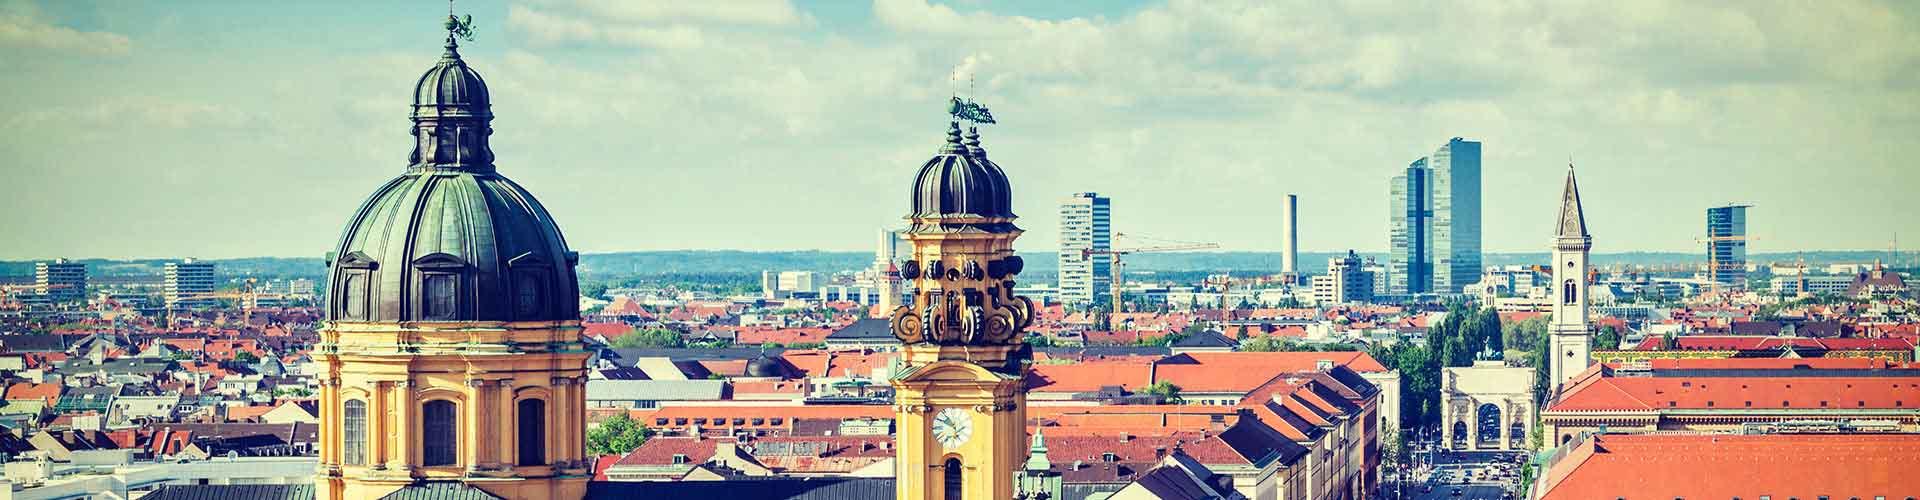 Munich – Hostels in Munich. Maps for Munich, Photos and Reviews for each hostel in Munich.